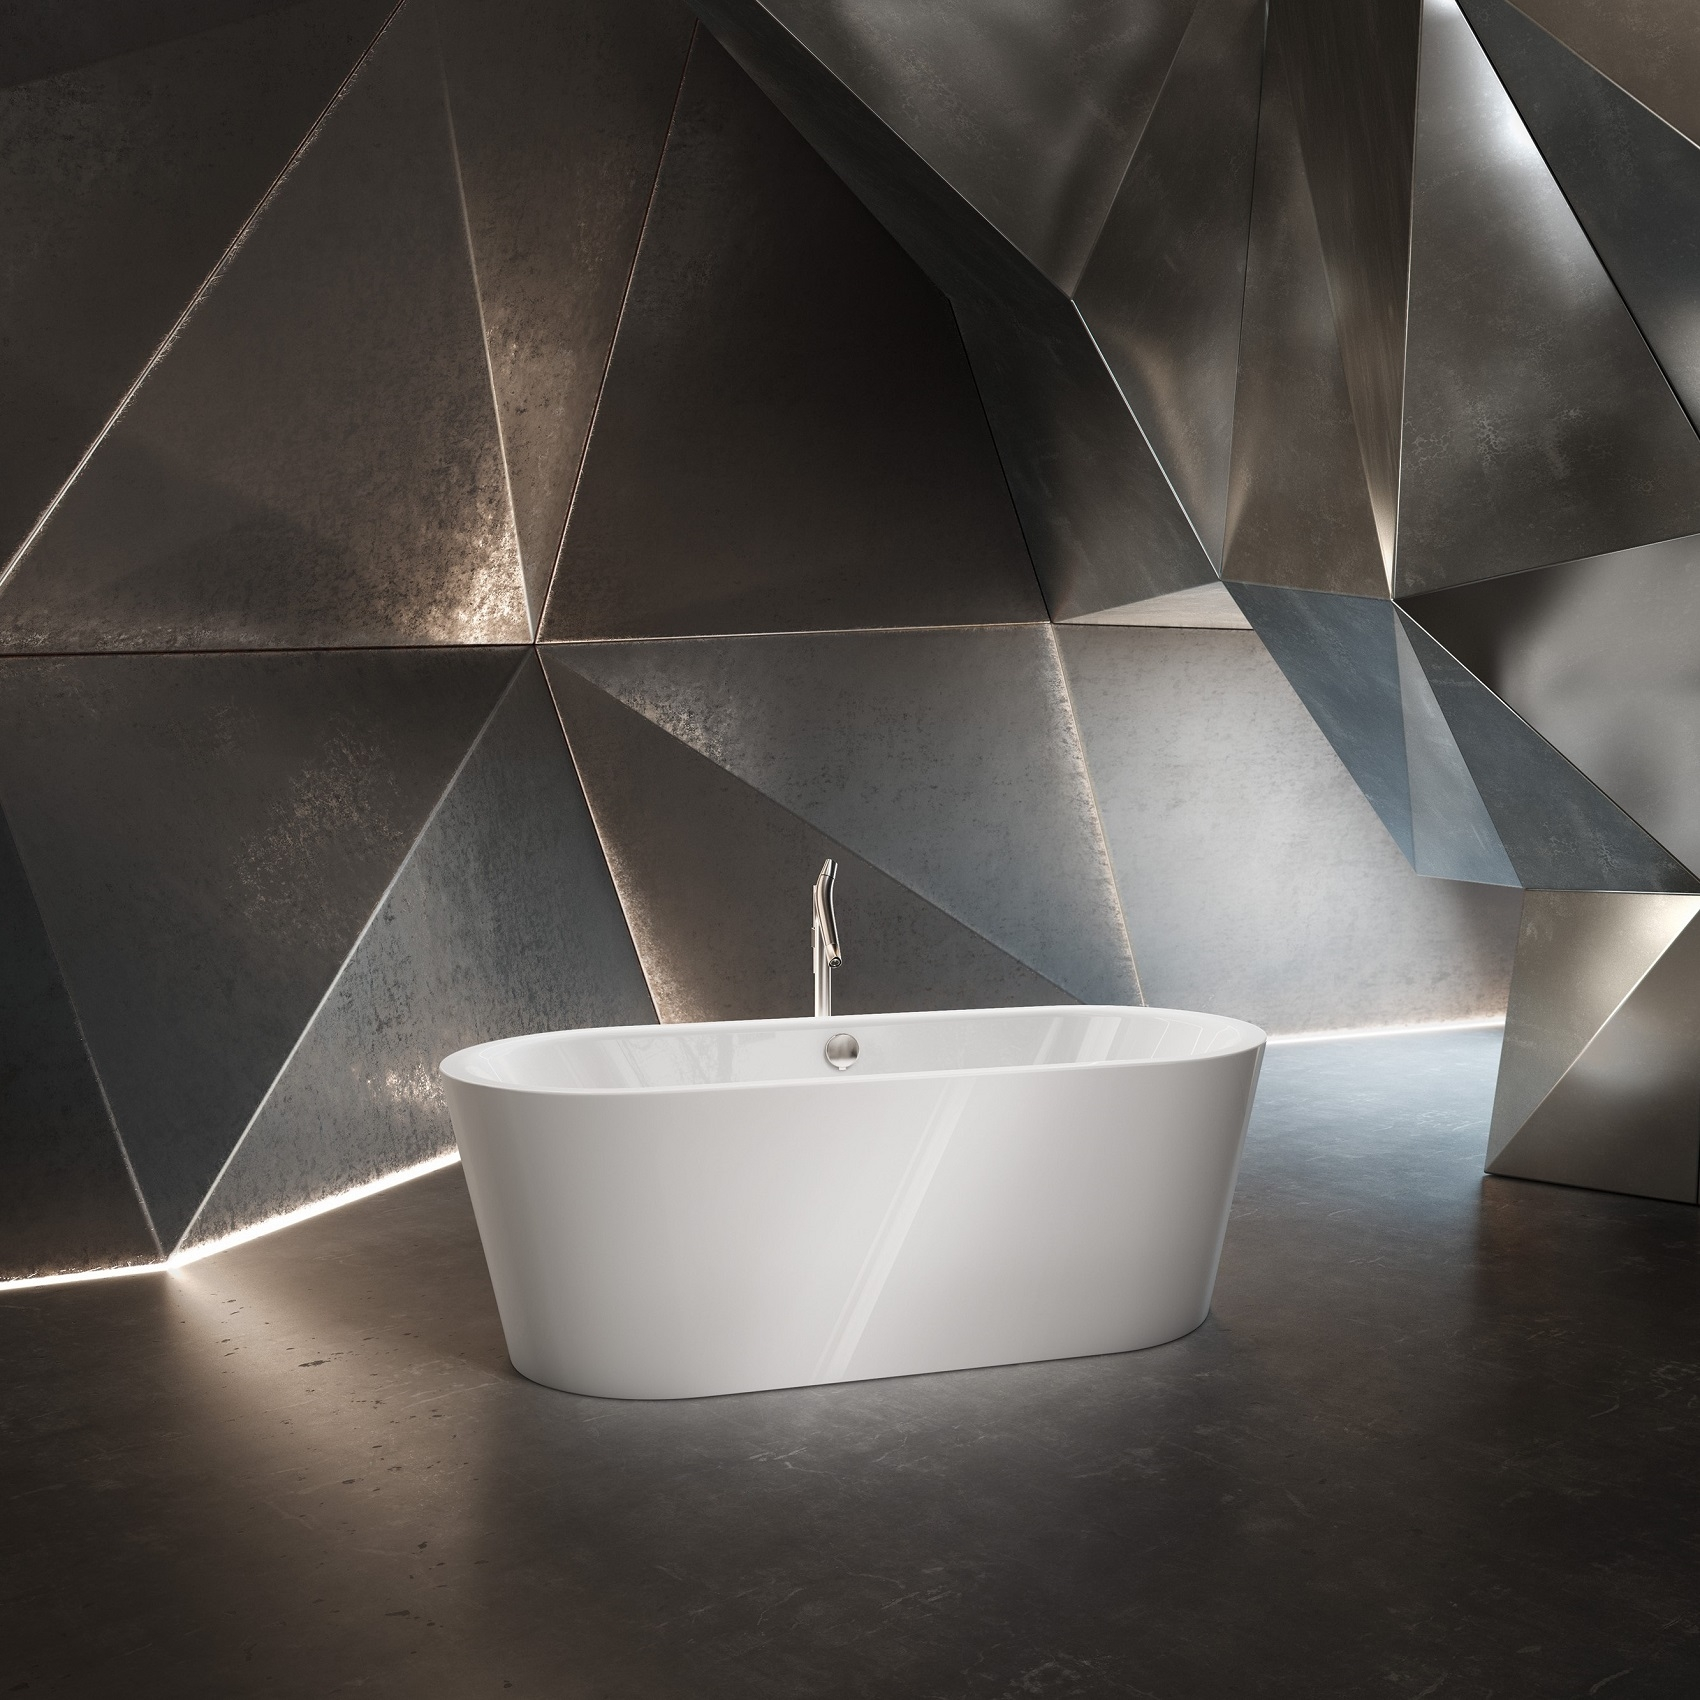 KALDEWEI MEISTERSTÜCK CLASSIC DUO OVAL FREESTANDING BATHTUB ...